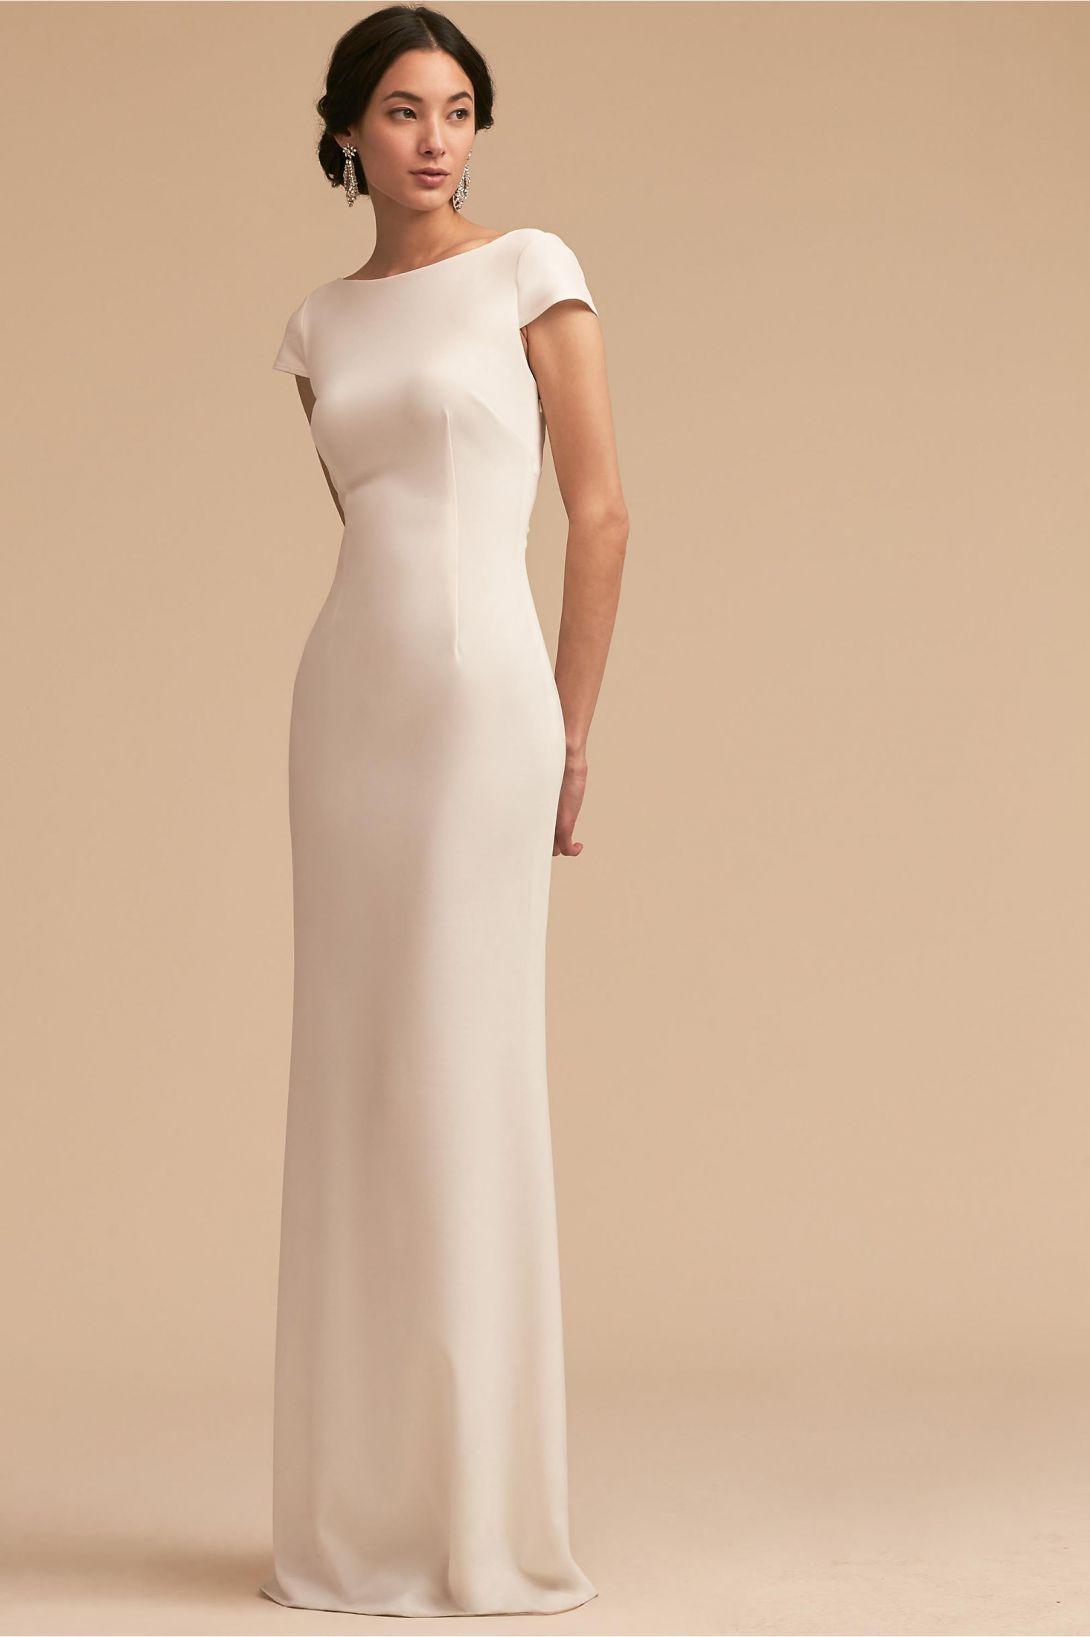 Under 1000 Dollar Wedding Dresses Cheap Bridal Gowns Bhldn Bridesmaid Dresses Wedding Dresses Classic Wedding Dress